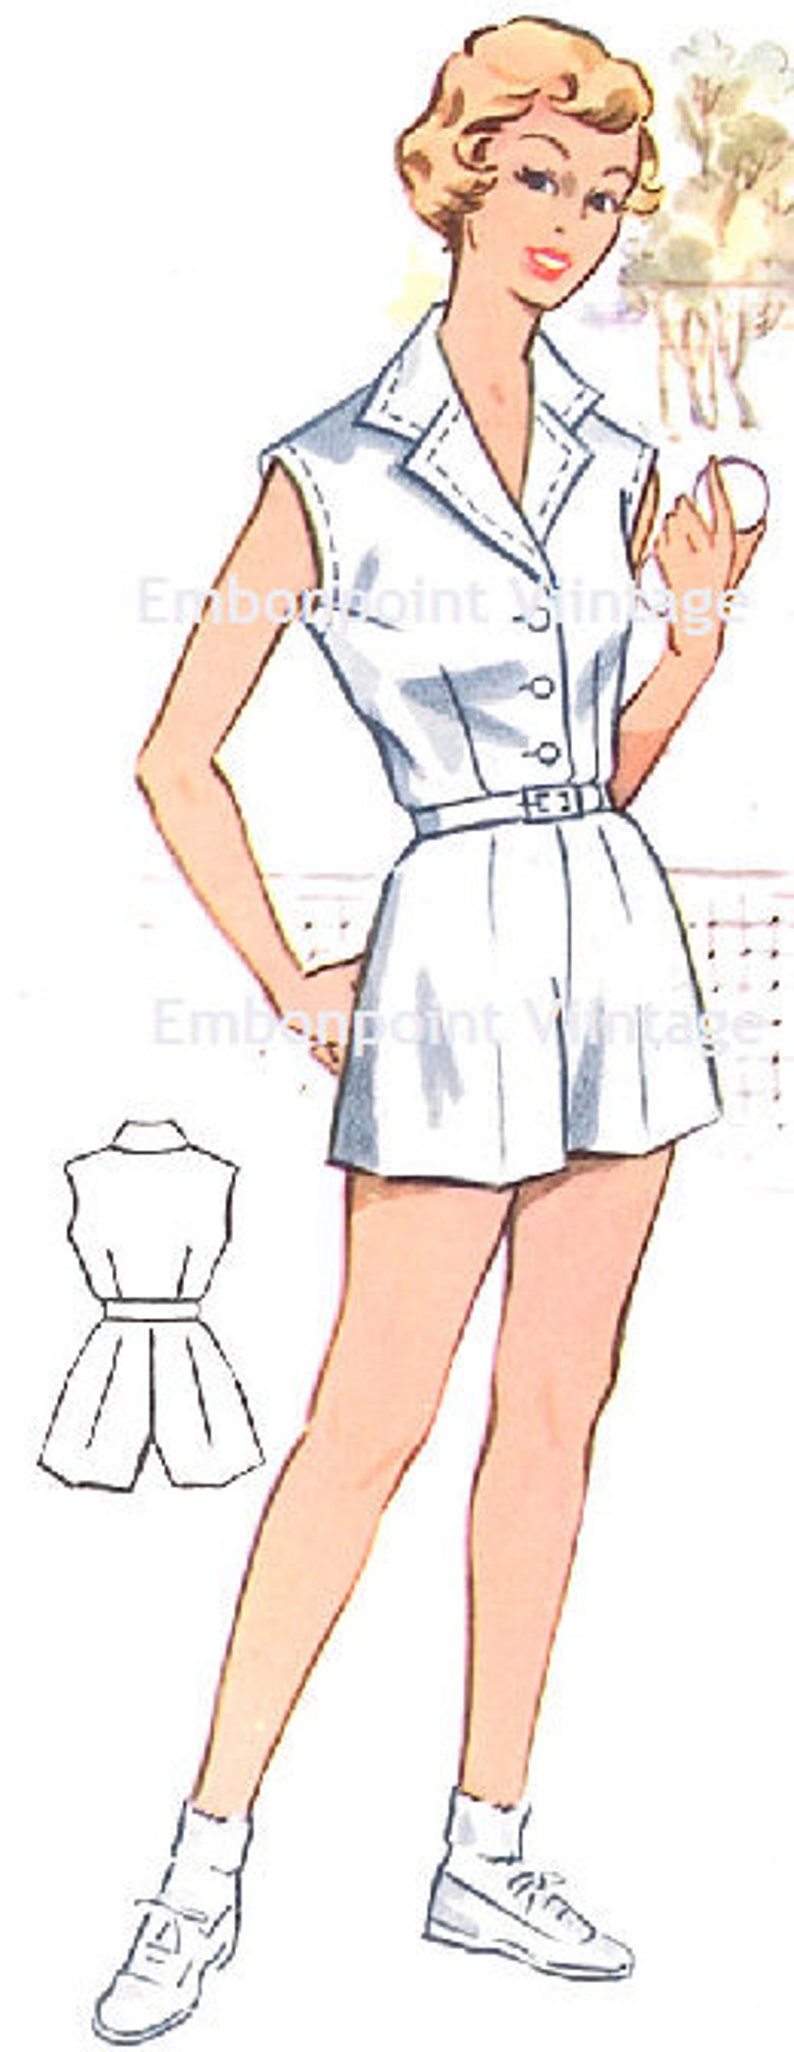 1950s Sewing Patterns | Dresses, Skirts, Tops, Mens Vintage 1950s Tennis Shorts Pattern - PDF - Pattern No 112b Dawn $5.35 AT vintagedancer.com